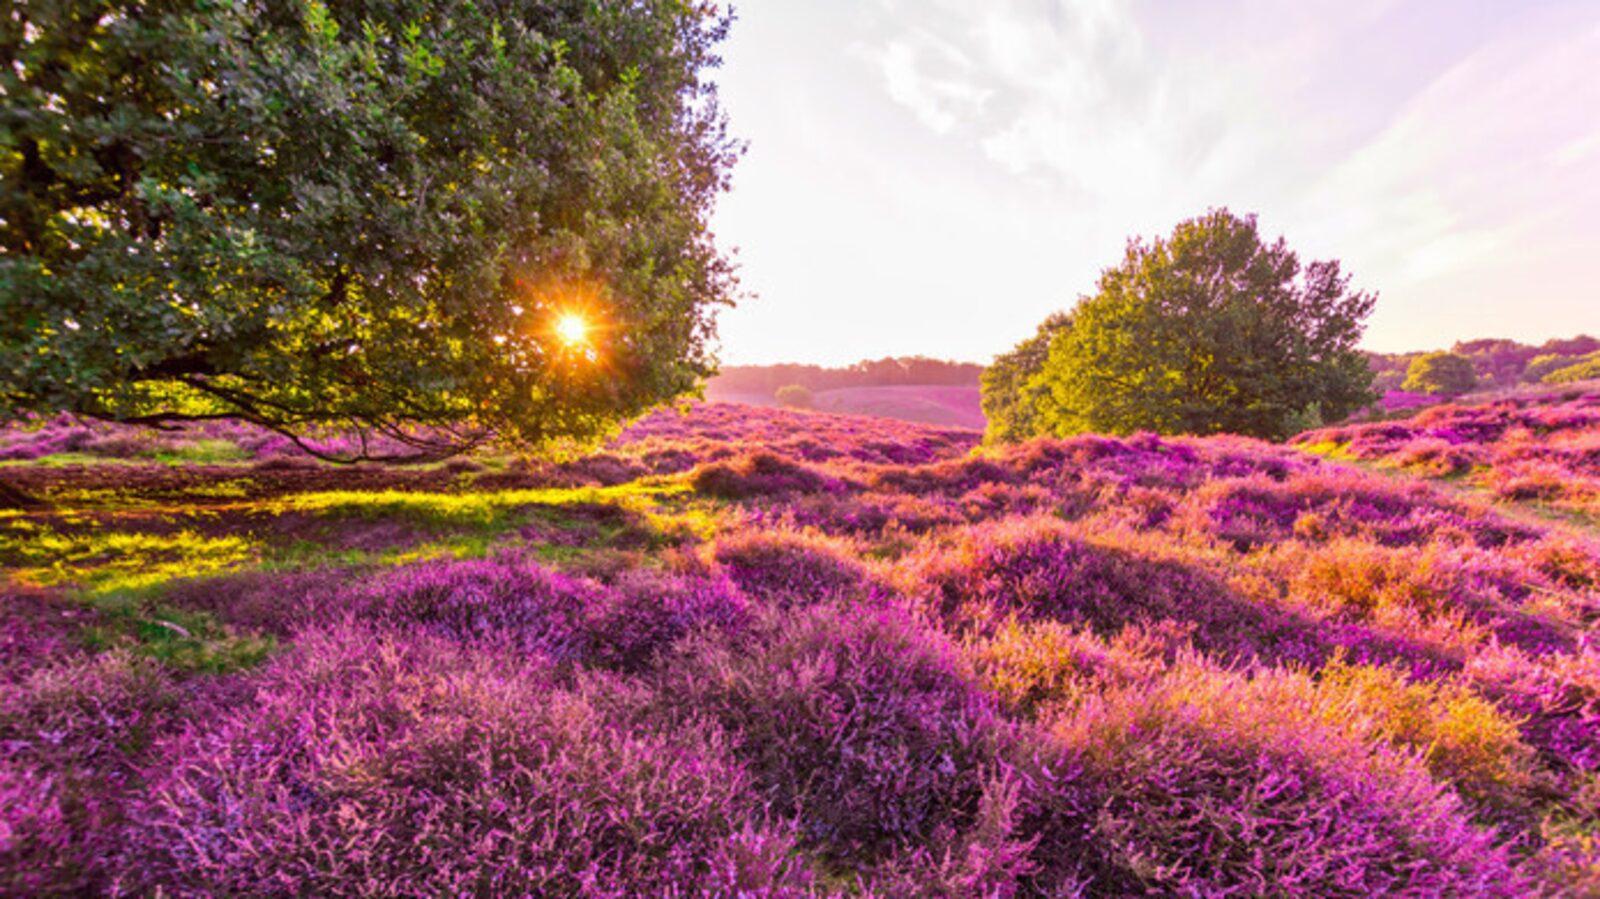 The purple carpet of blooming heather, experience weeks